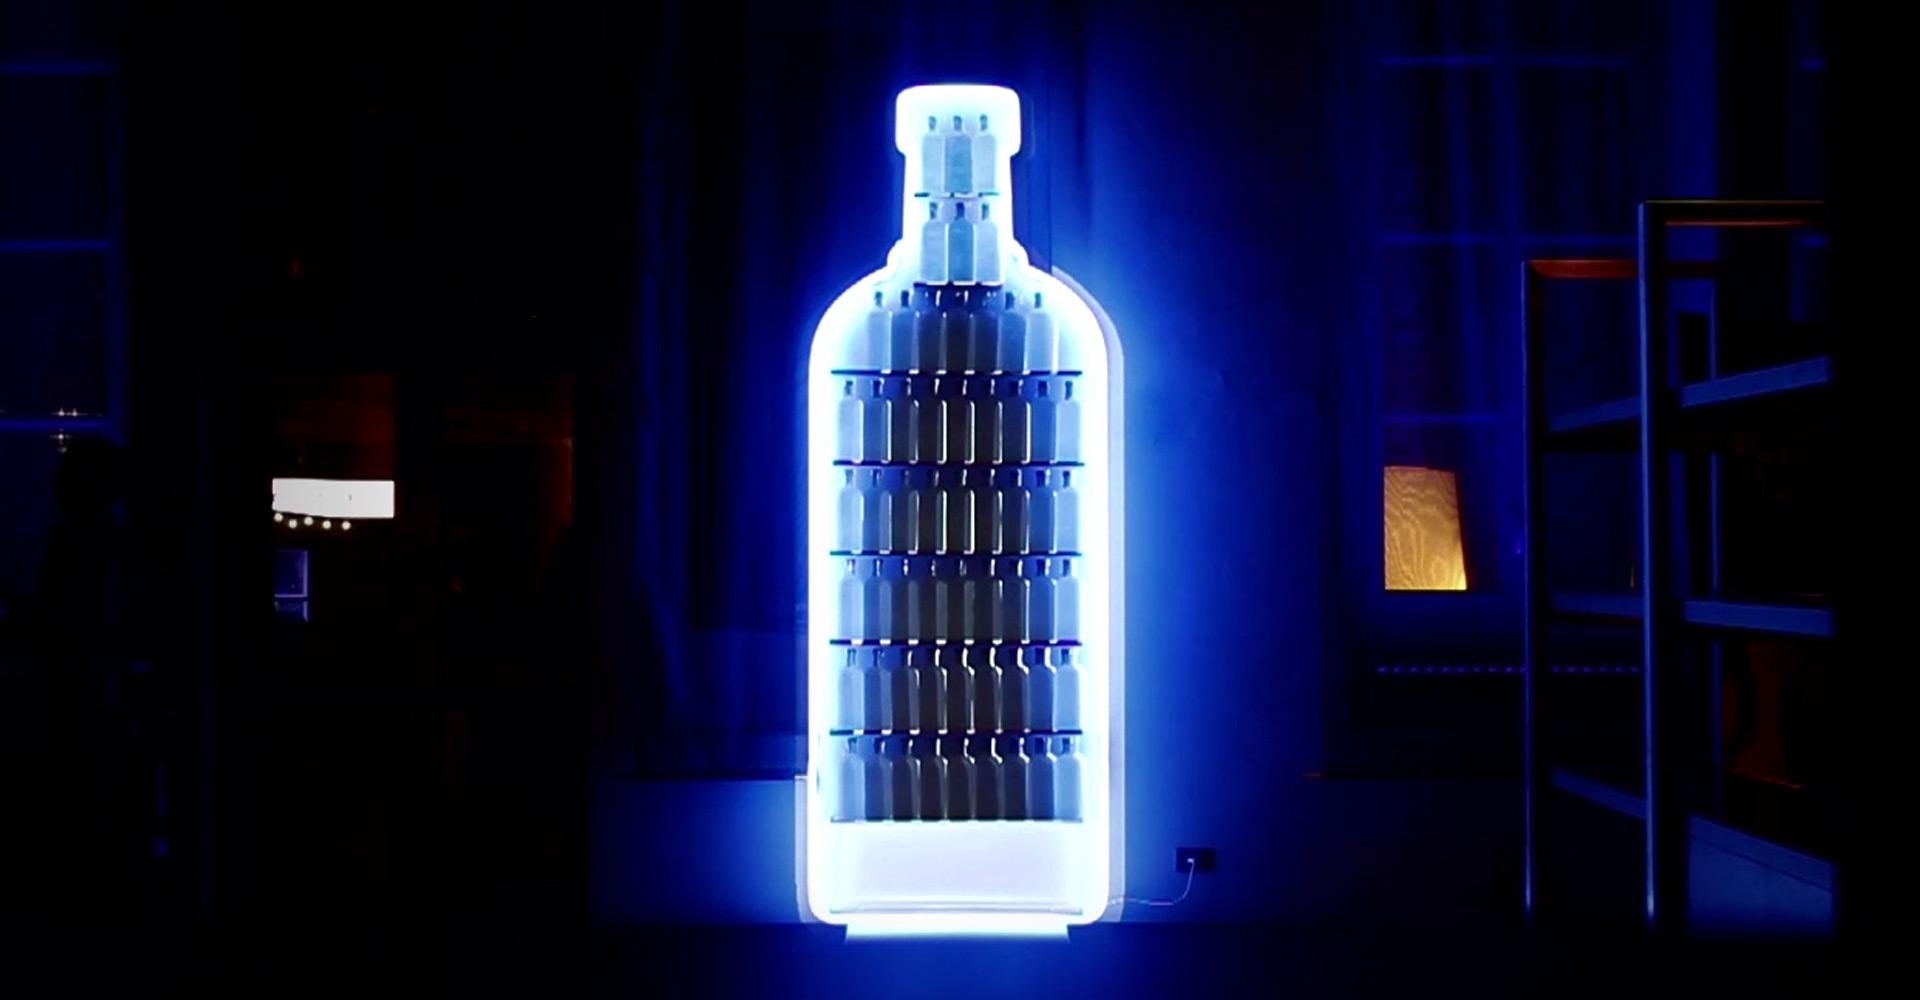 ultravioletto_Club-2-Club-Interactive-Installation-Absolut-Vodka-5